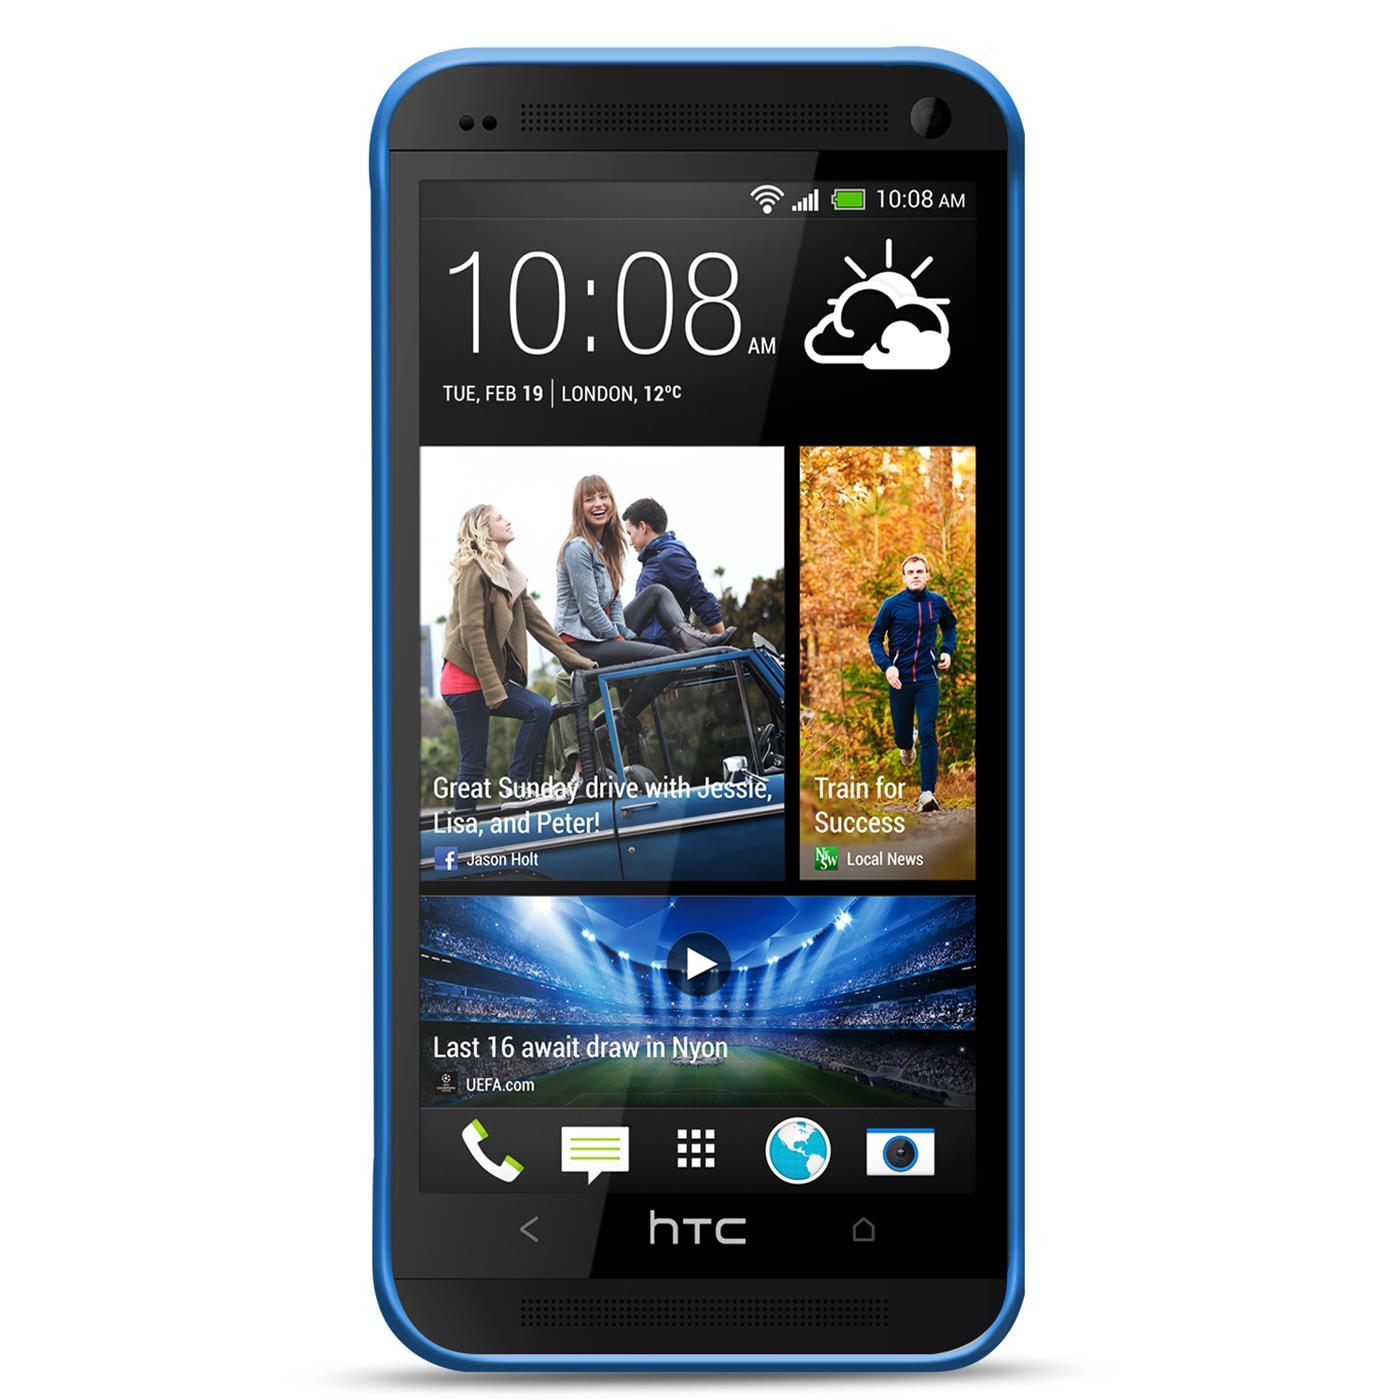 HTC-One-m9-Silikon-Gel-S-Line-Case-Cover-Ultra-Thin-Slim-Back-Bumper Indexbild 9